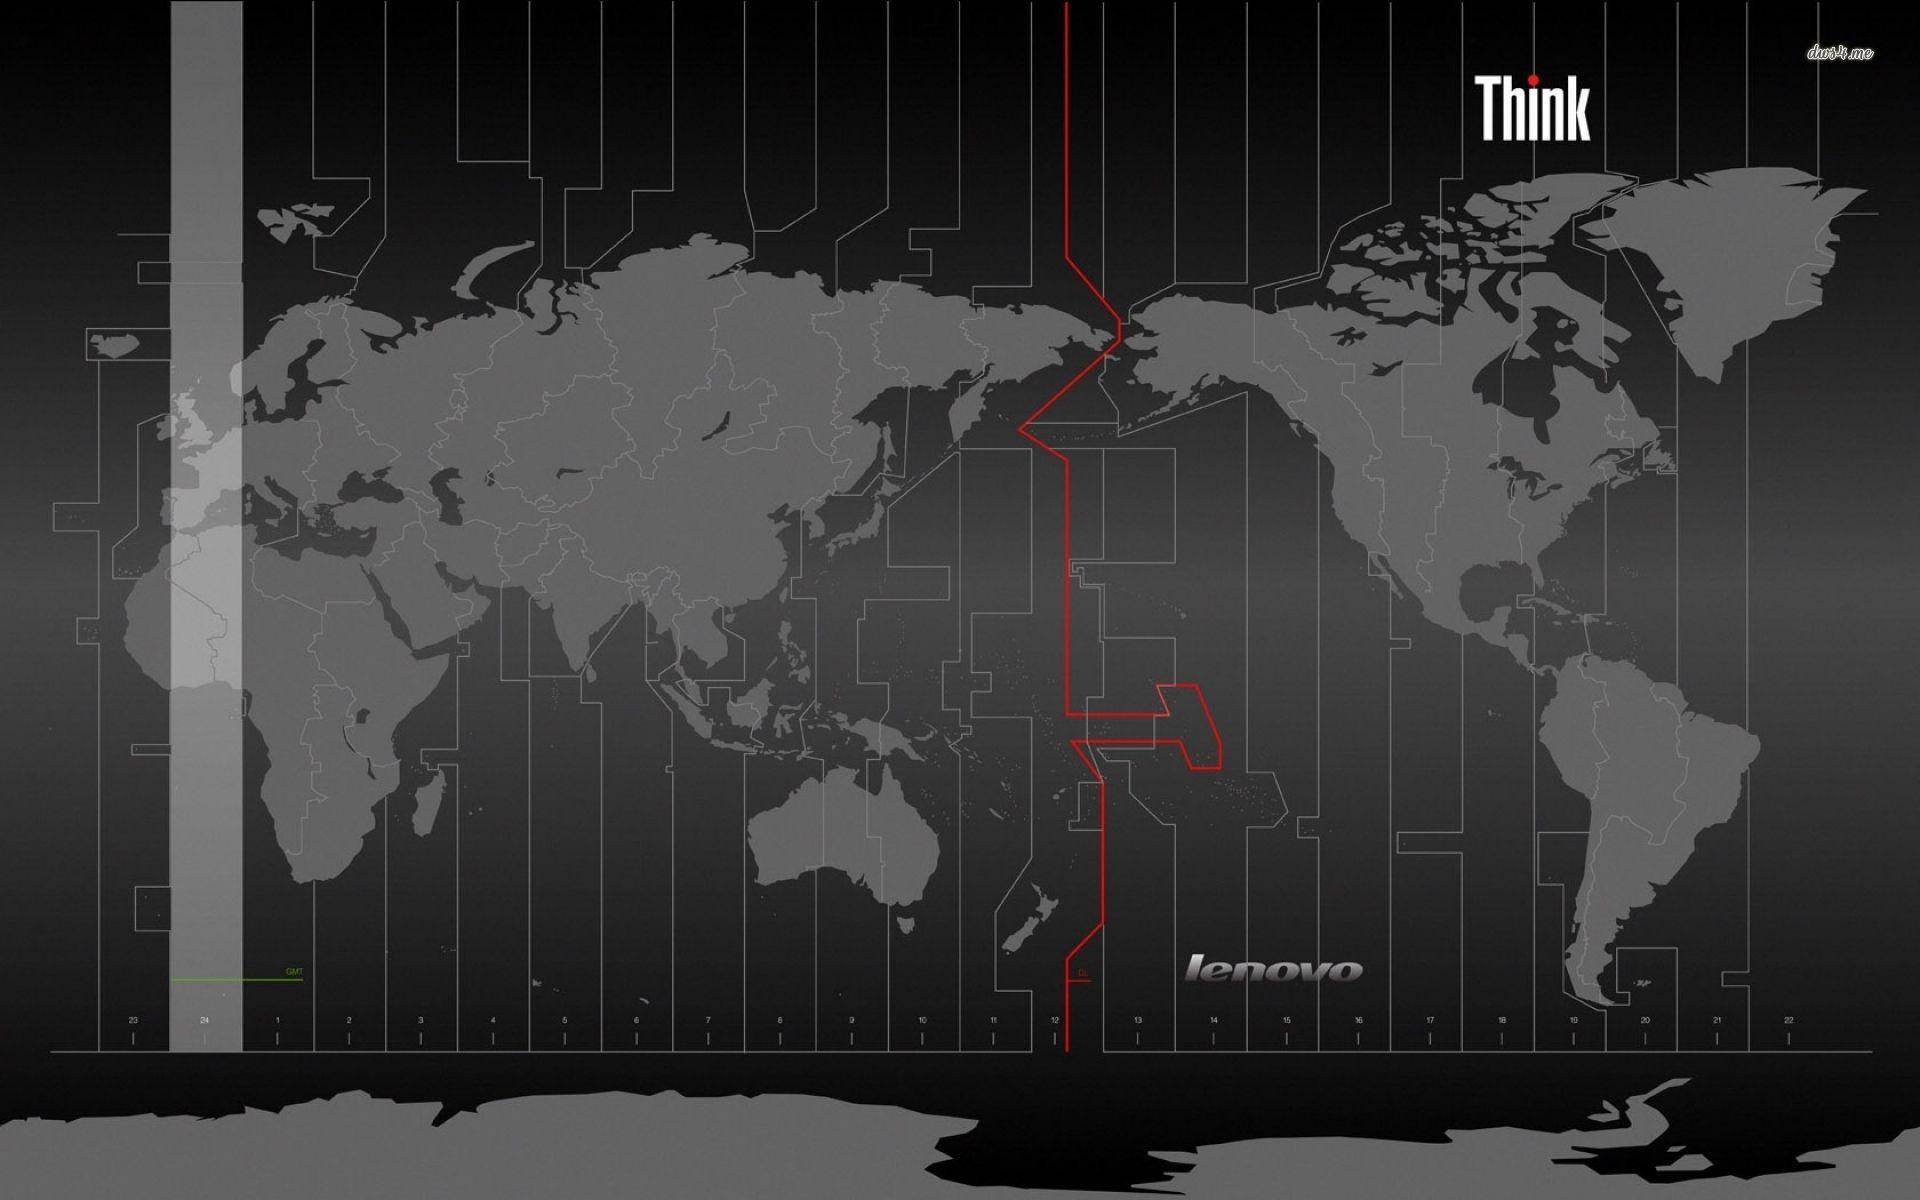 Thinkpad Wallpaper 754162 Lenovo Wallpapers World Map